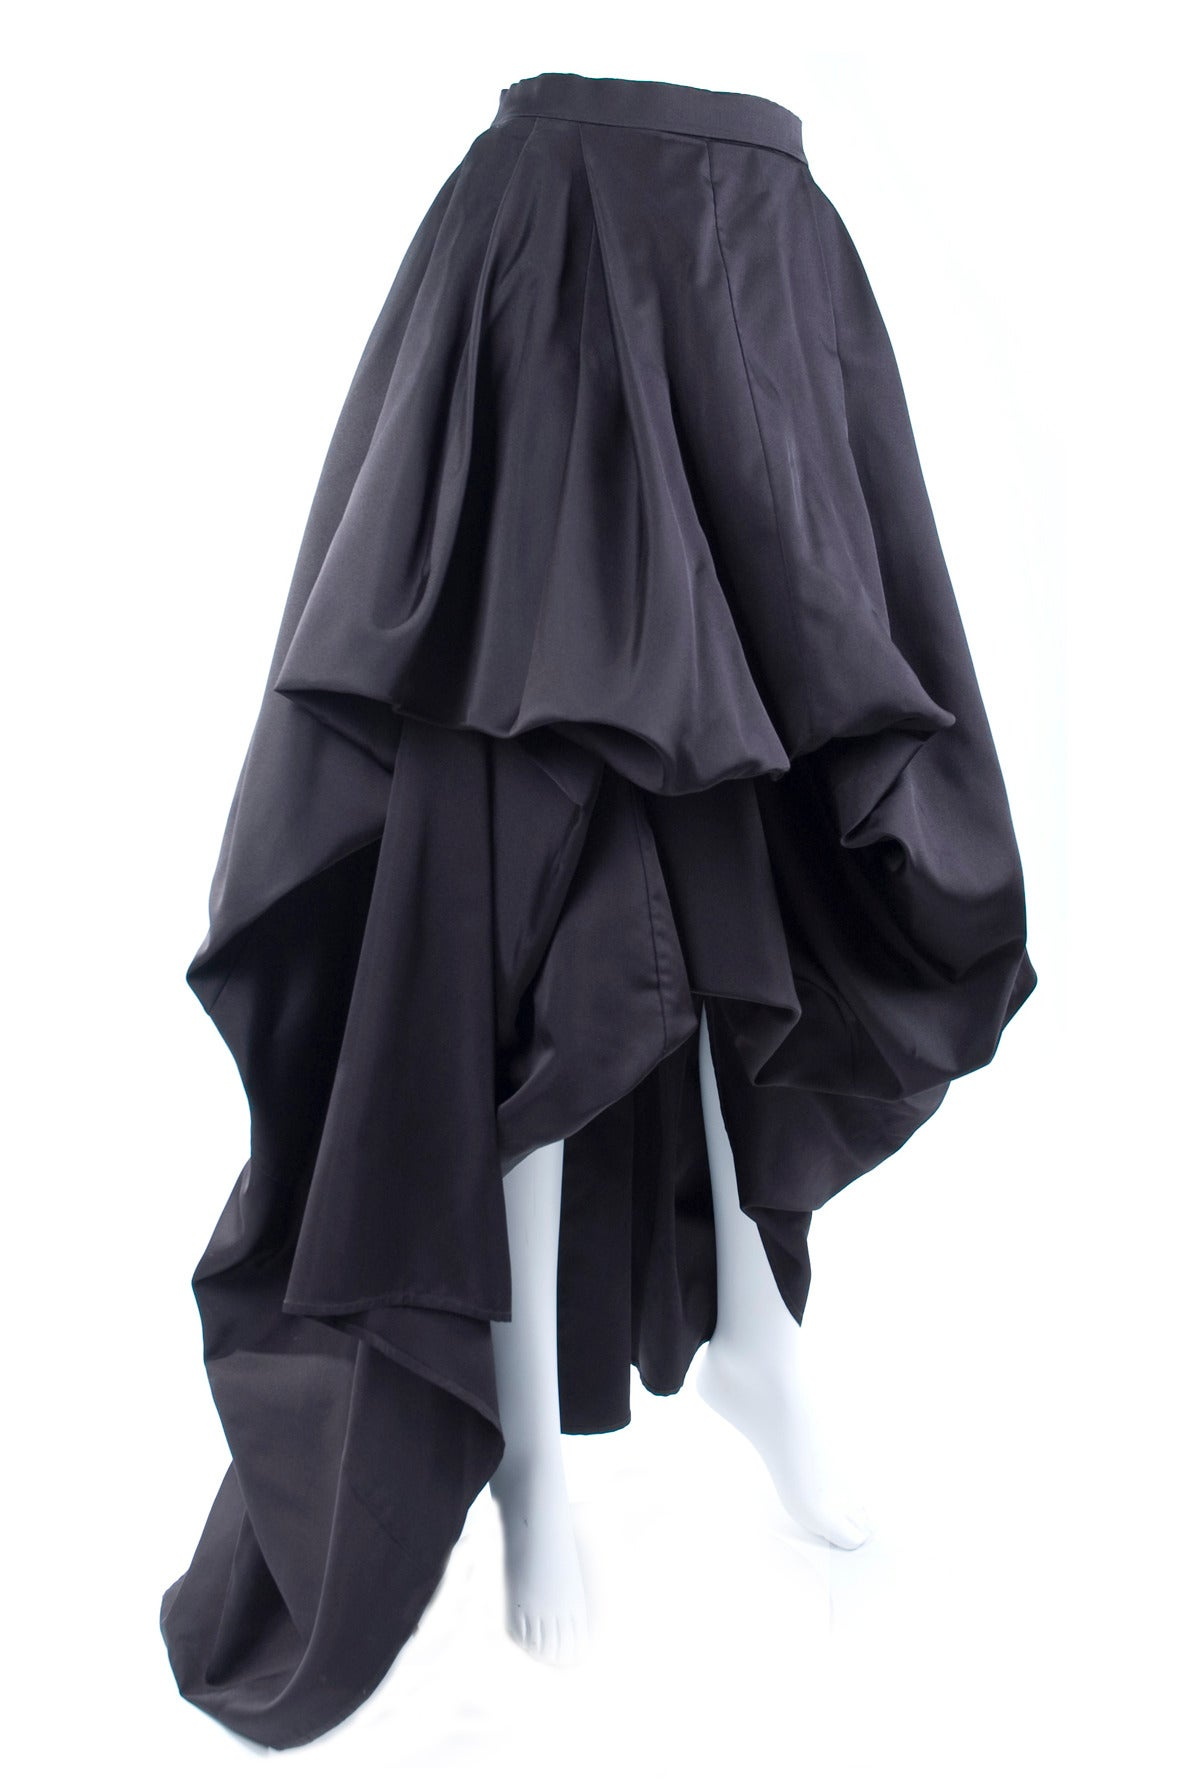 Rare Vintage HERMES Asymetrical Evening Skirt in Black Silk 4